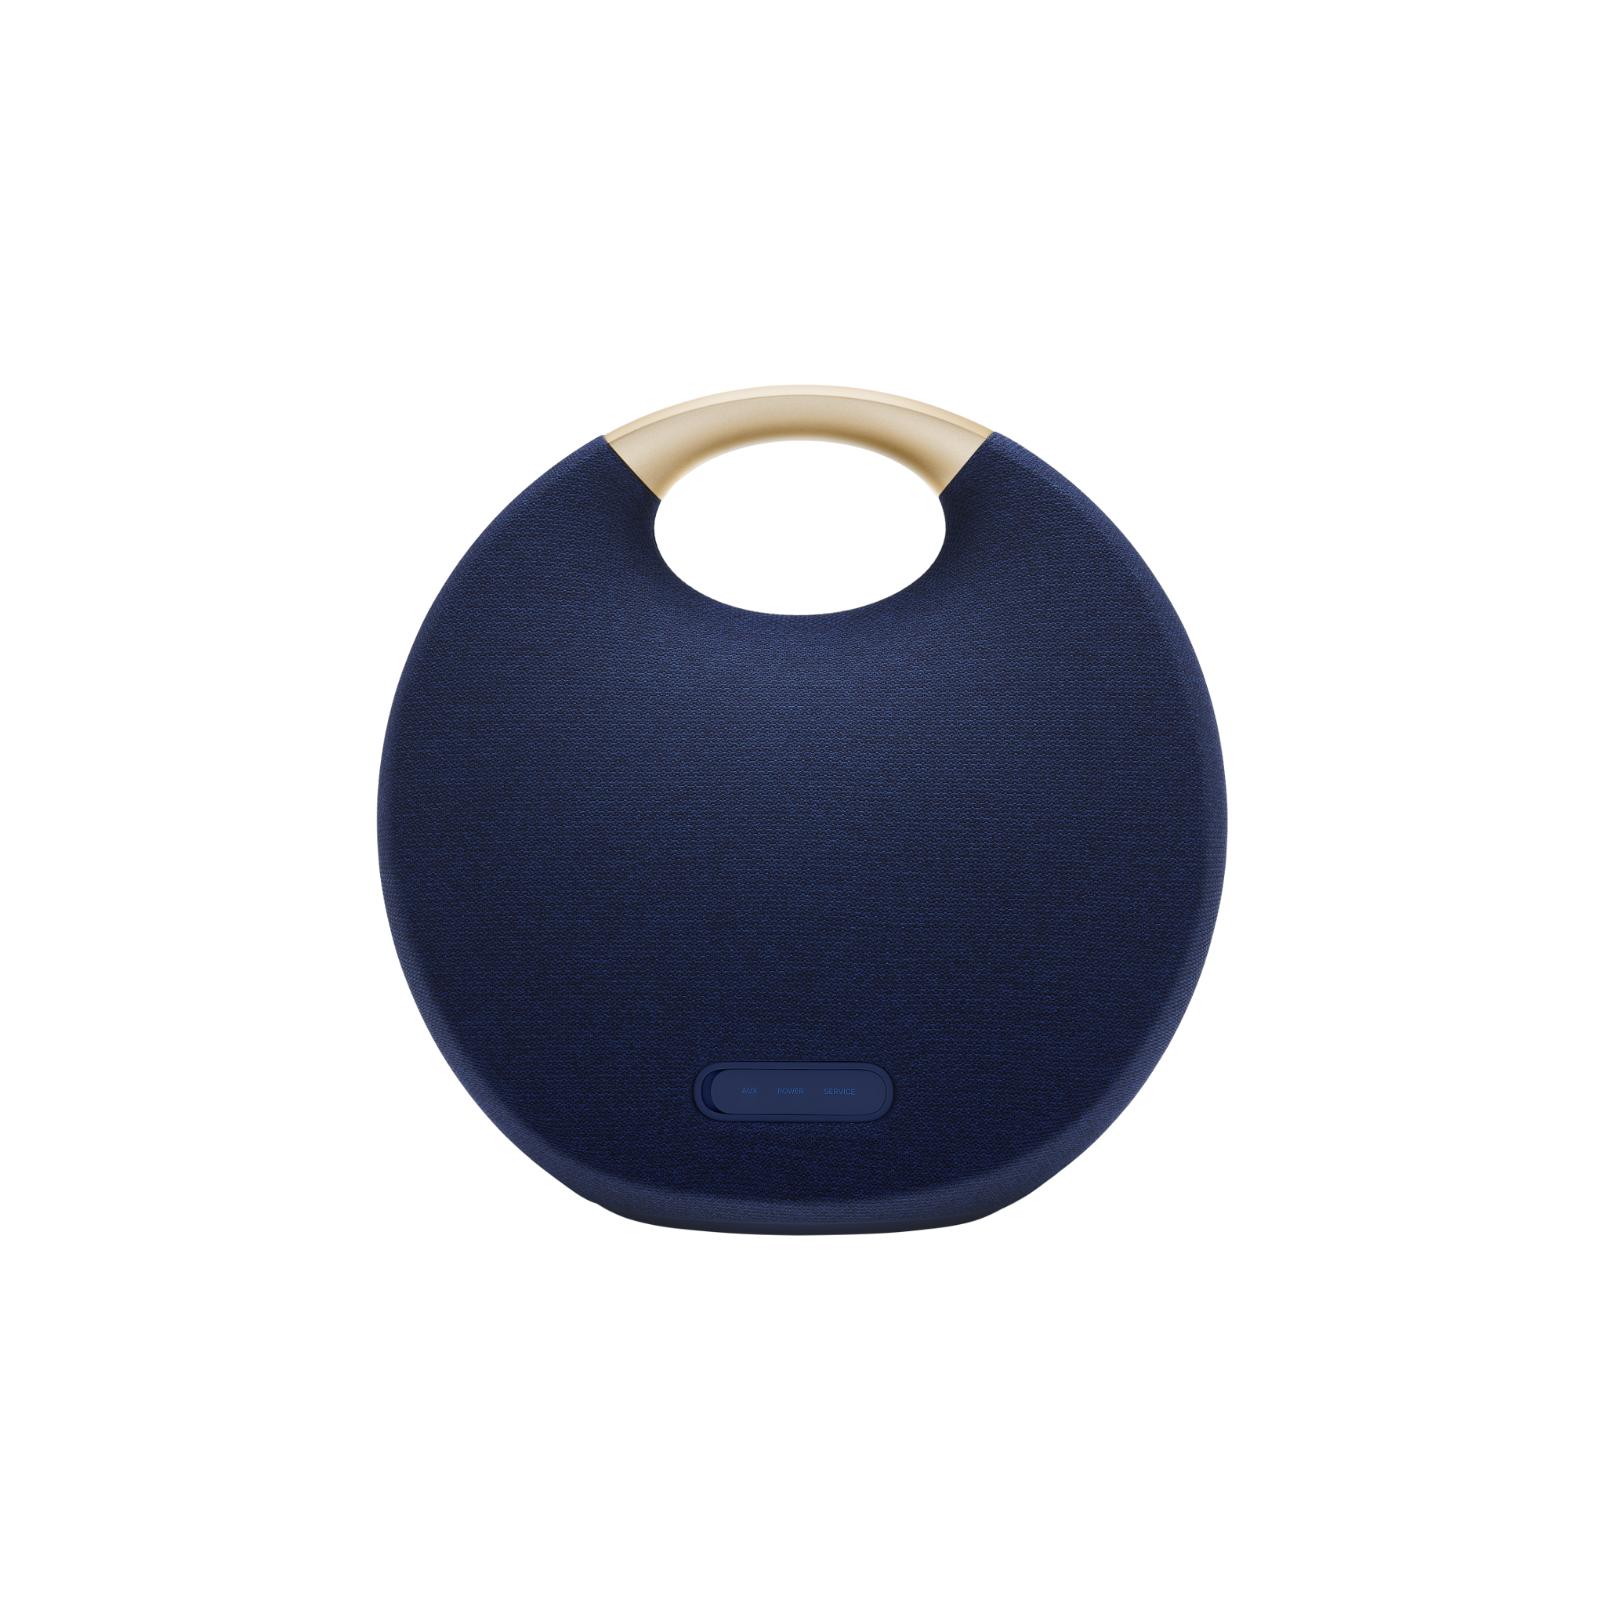 Onyx Studio 6 - Blue - Portable Bluetooth speaker - Back